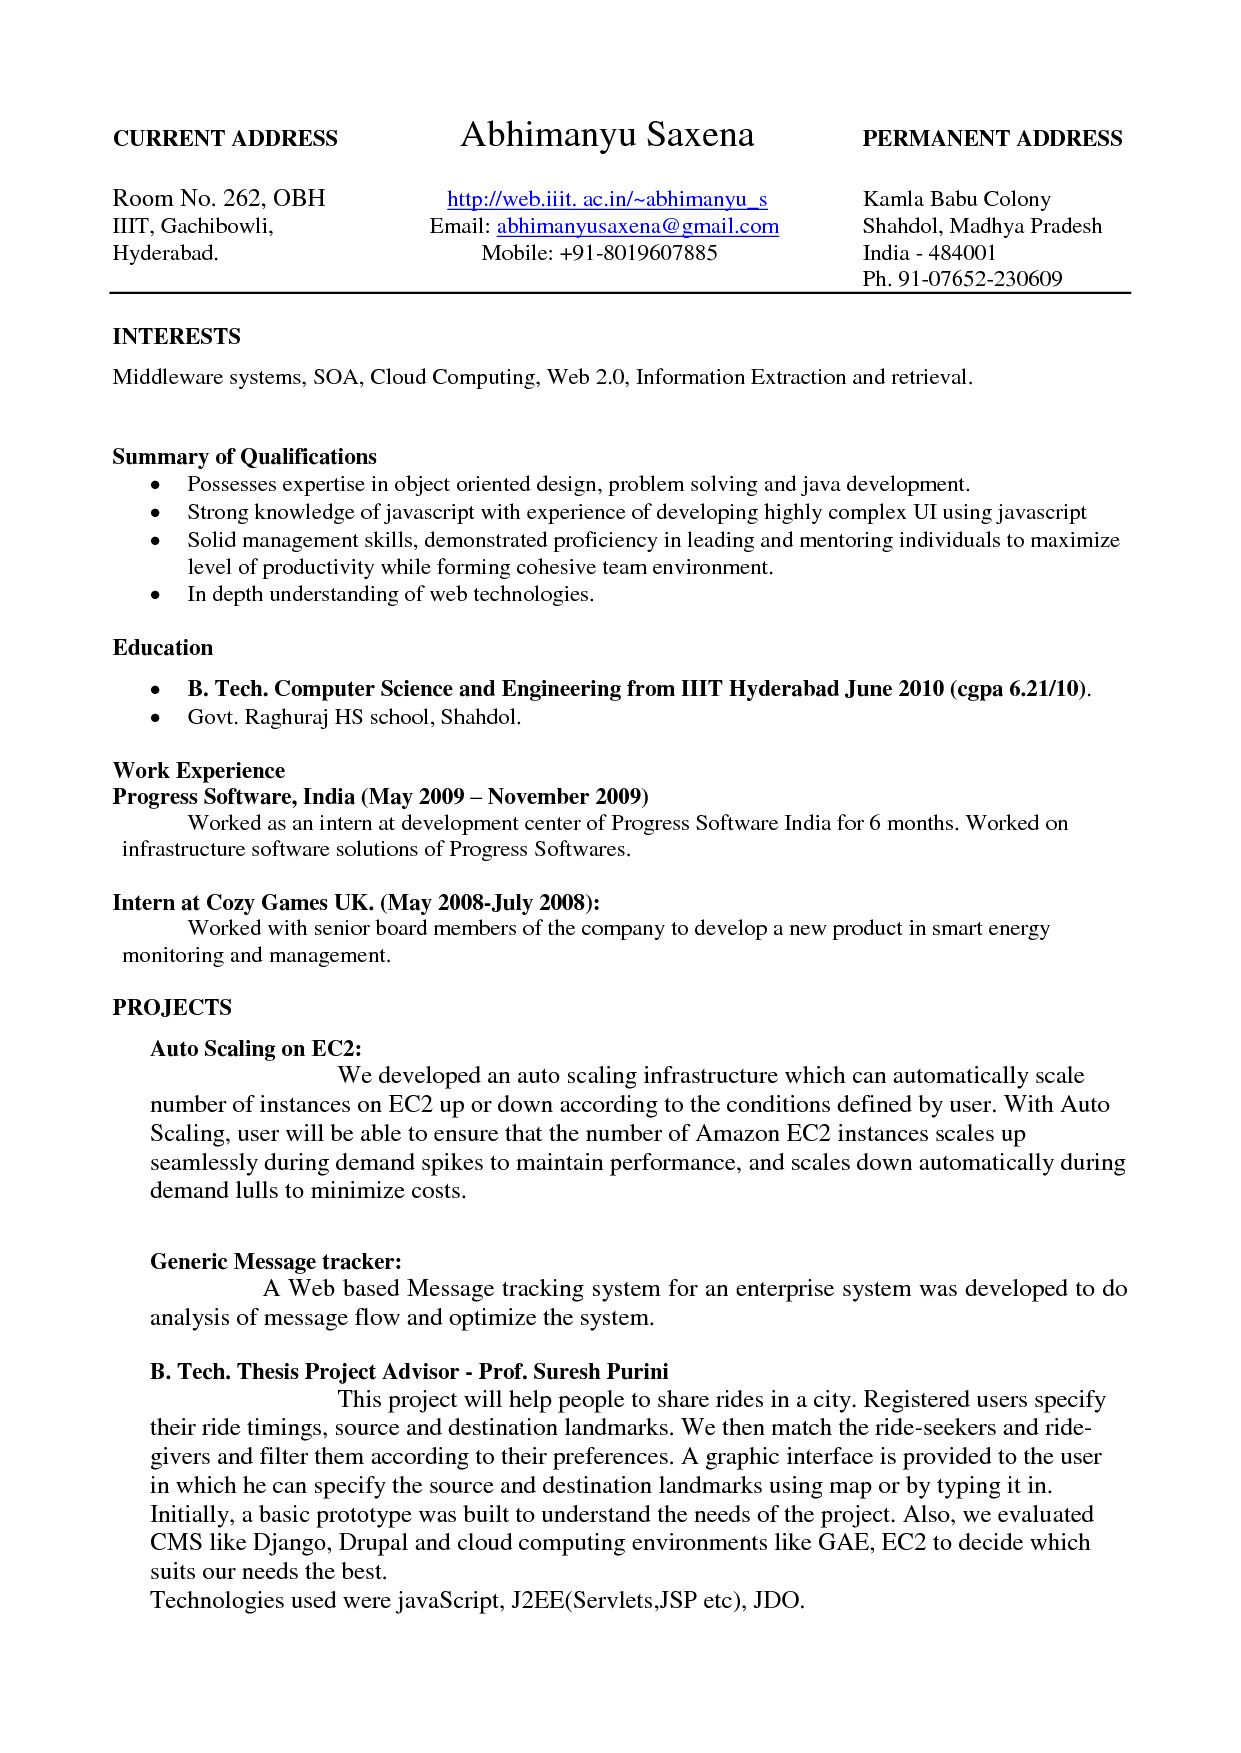 Scholarship Resume Template Google Docs in 2020 Student